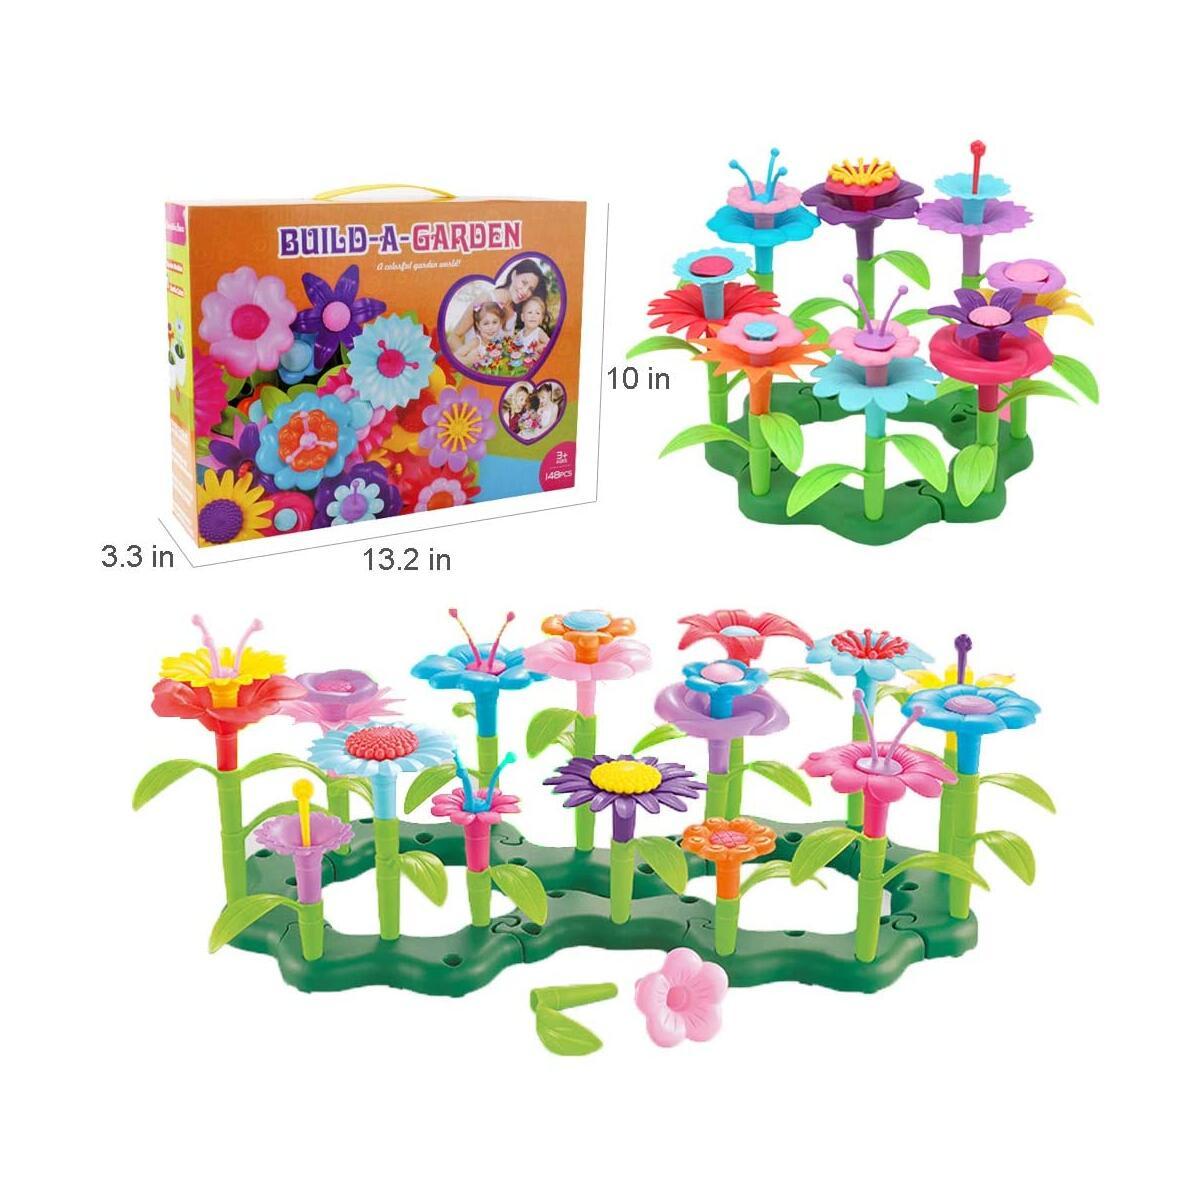 WISHTIME Flower Garden Building Toy Set - 148 Pcs Build a Bouquet Floral Arrangement Playset Pretend Gardening Blocks Educational Creative Craft Toys for 3, 4, 5, 6 7 8 Year Old Toddlers Kids Girls